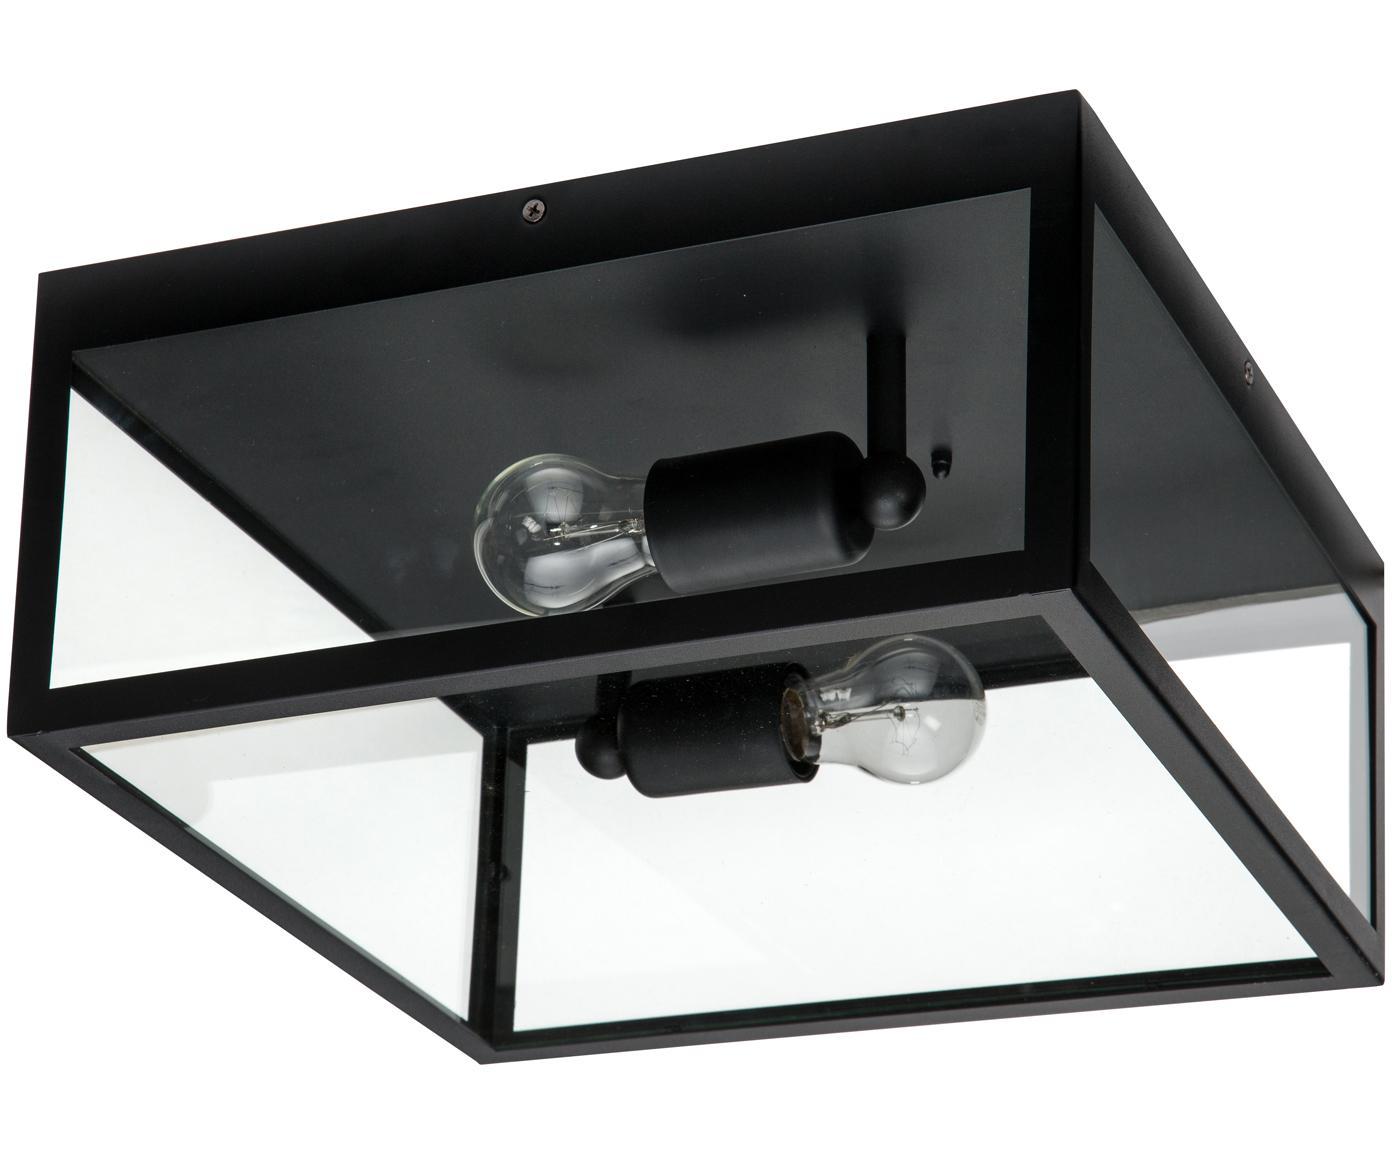 Plafoniera industriale Aberdeen, Acciaio verniciato, vetro, Nero, trasparente, Larg. 36 x Alt. 16 cm